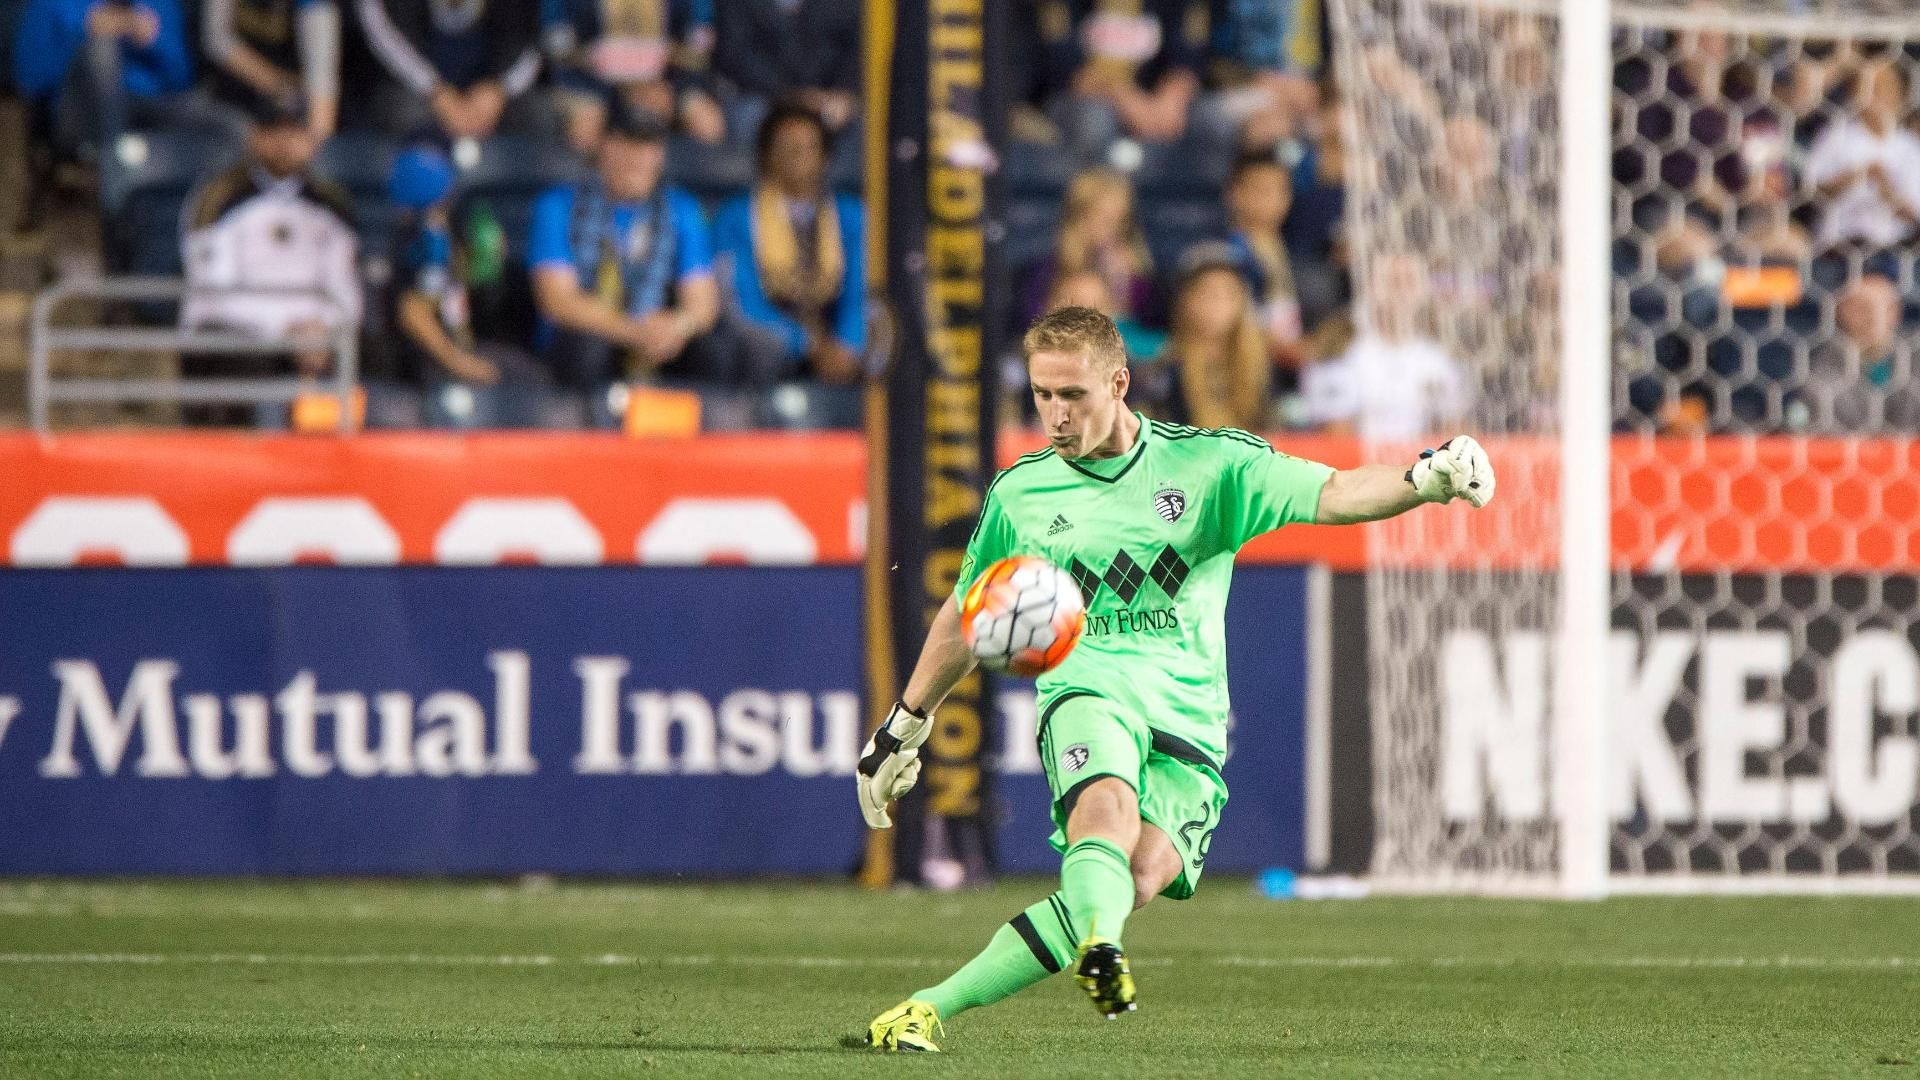 Video via MLS: D.C. United 0-0 SKC